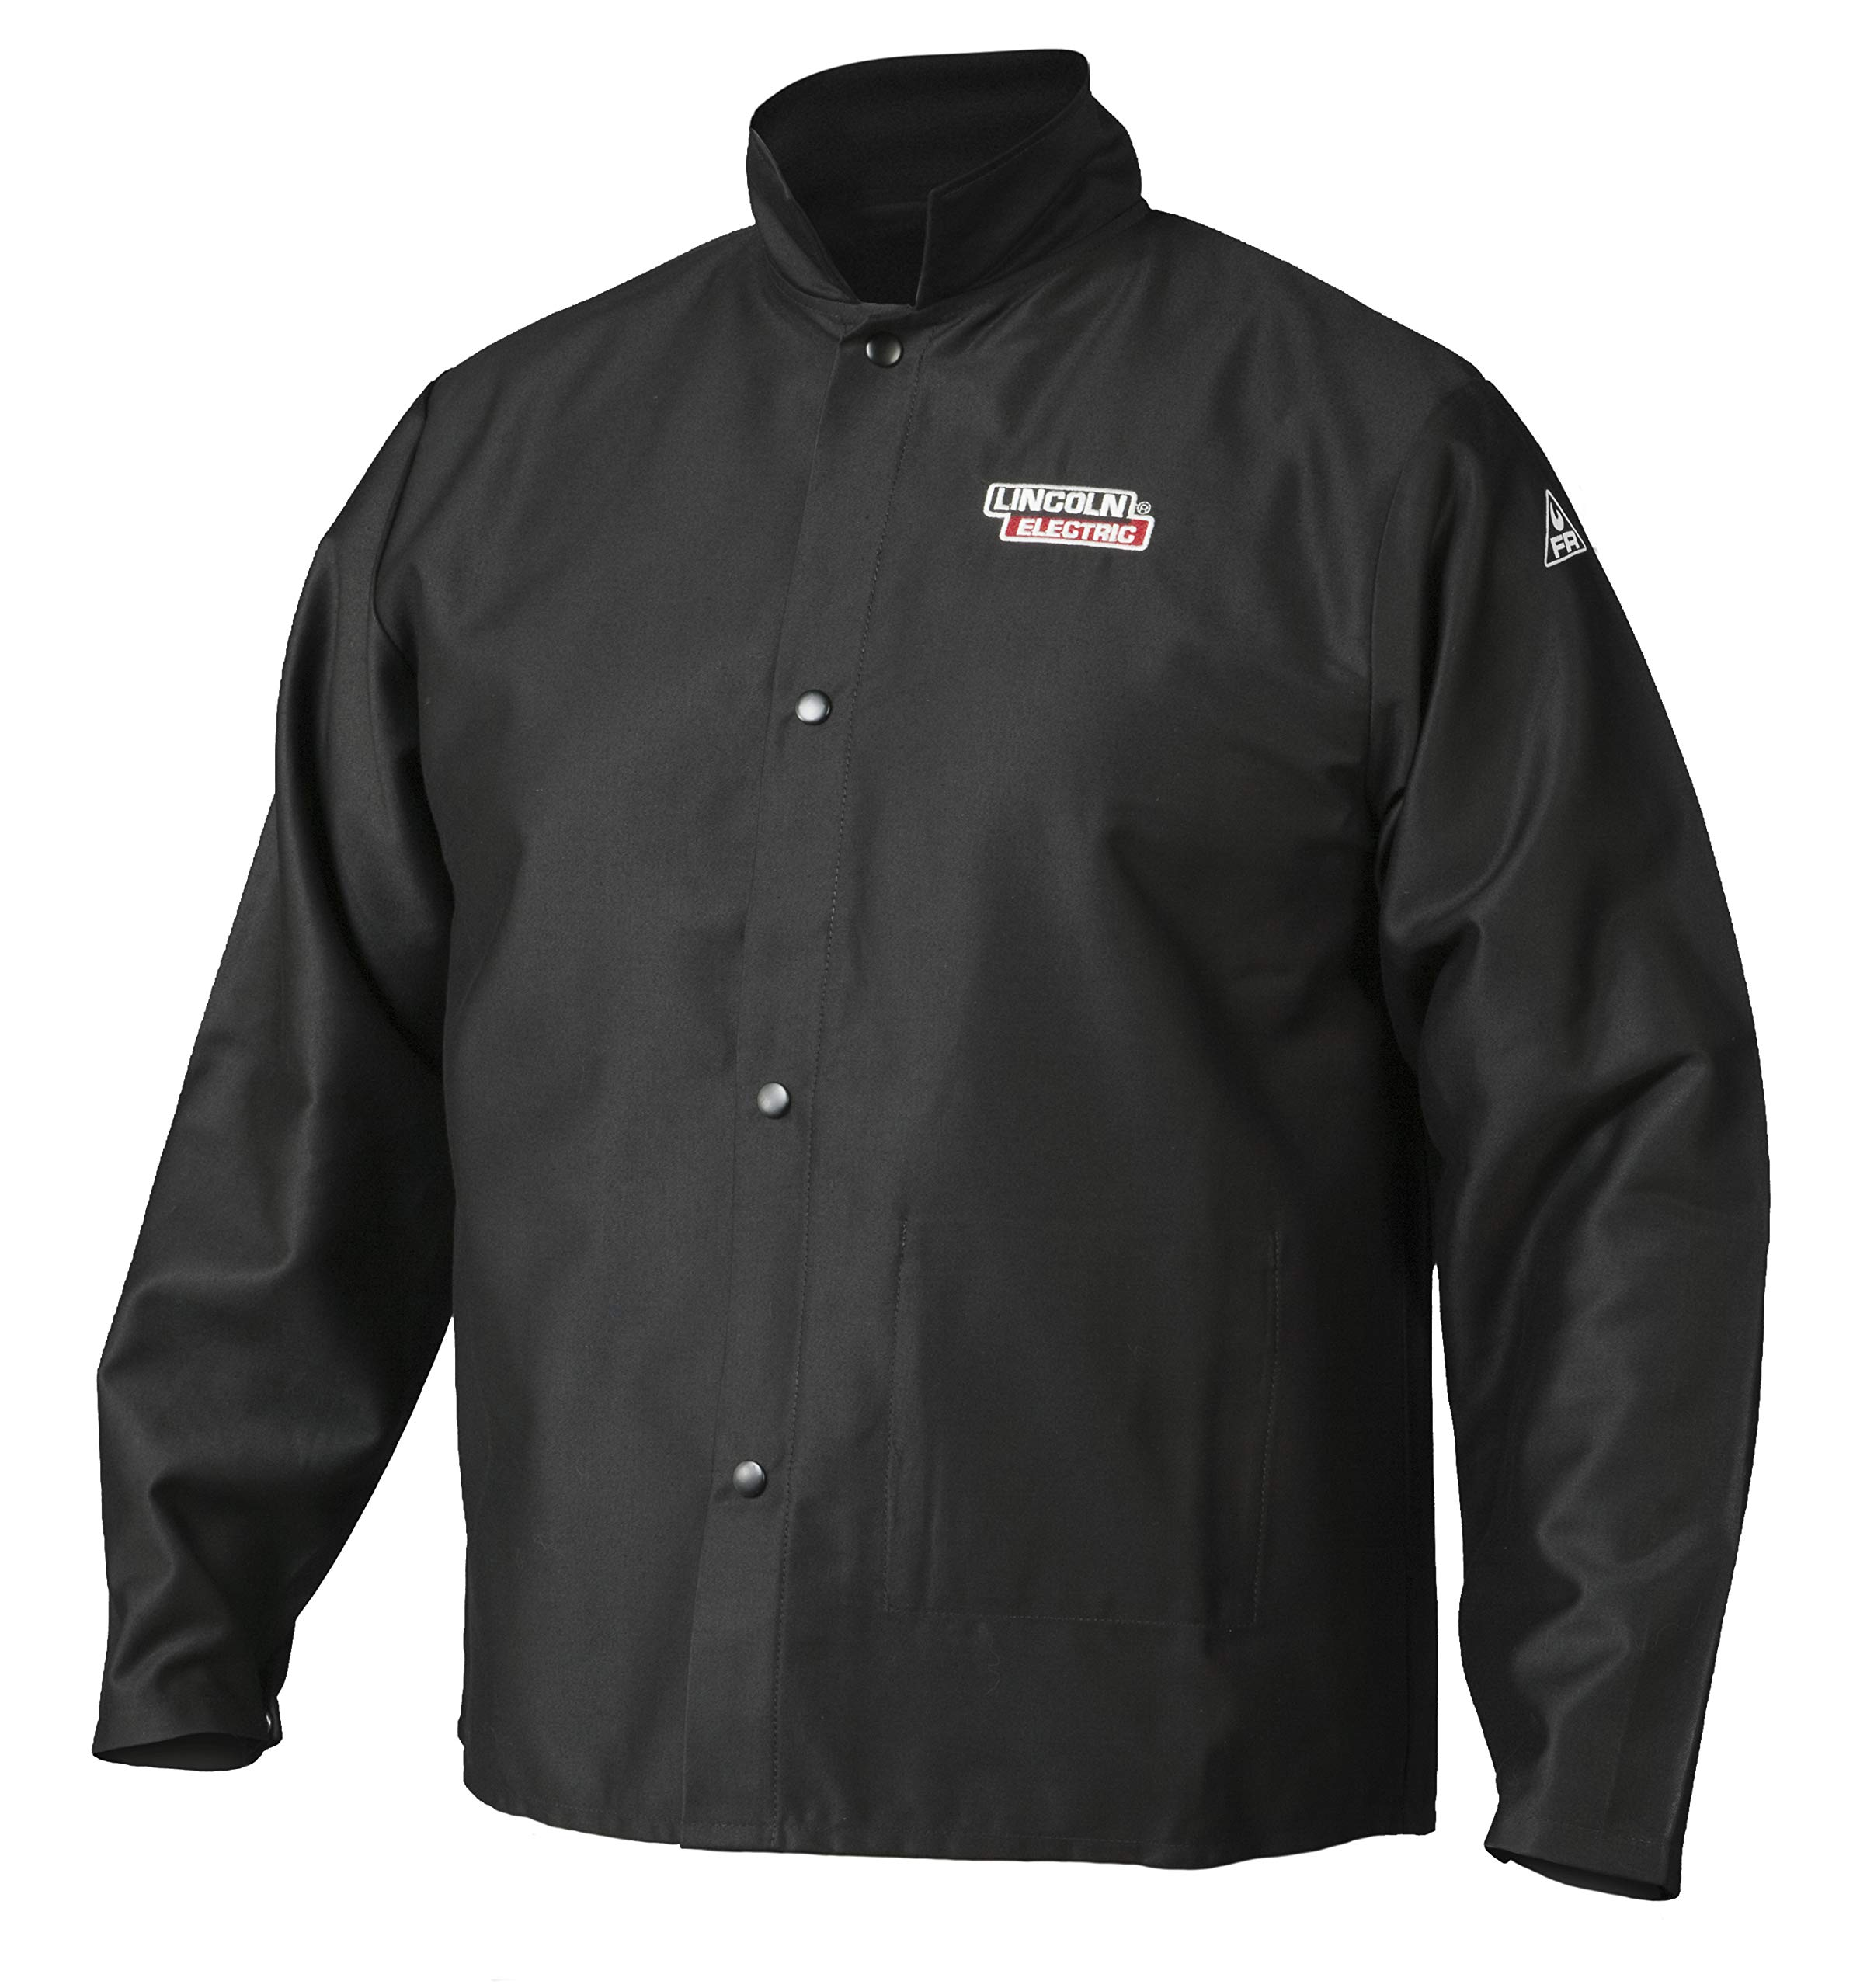 Lincoln Electric  Premium Flame Resistant (FR) Cotton Welding Jacket   Comfortable   Black   XXXL   K2985-XXXL